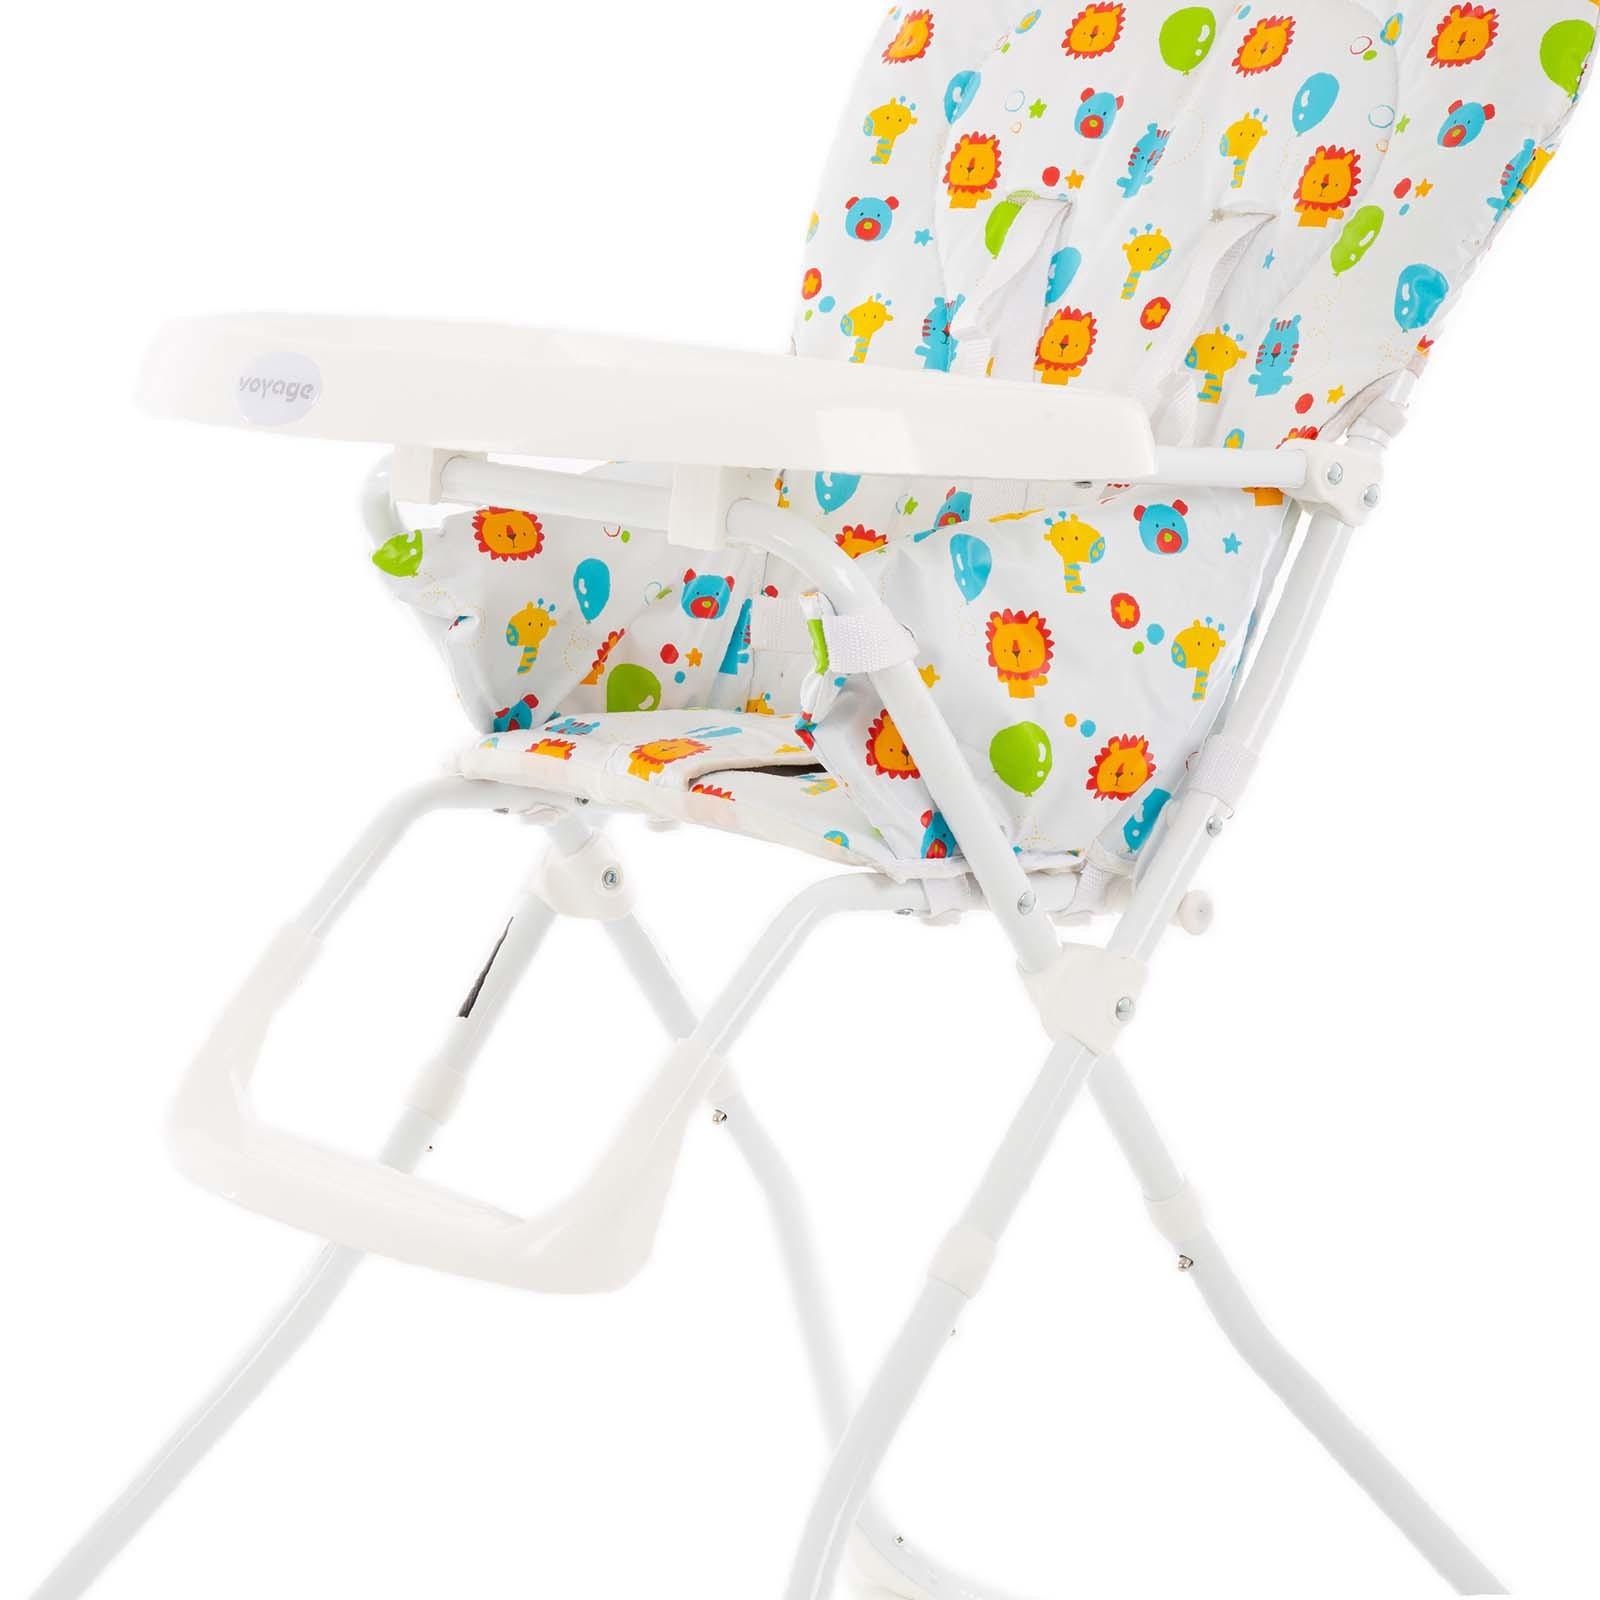 Cadeira De Alimentação Kitut Branco Zoo Voyage